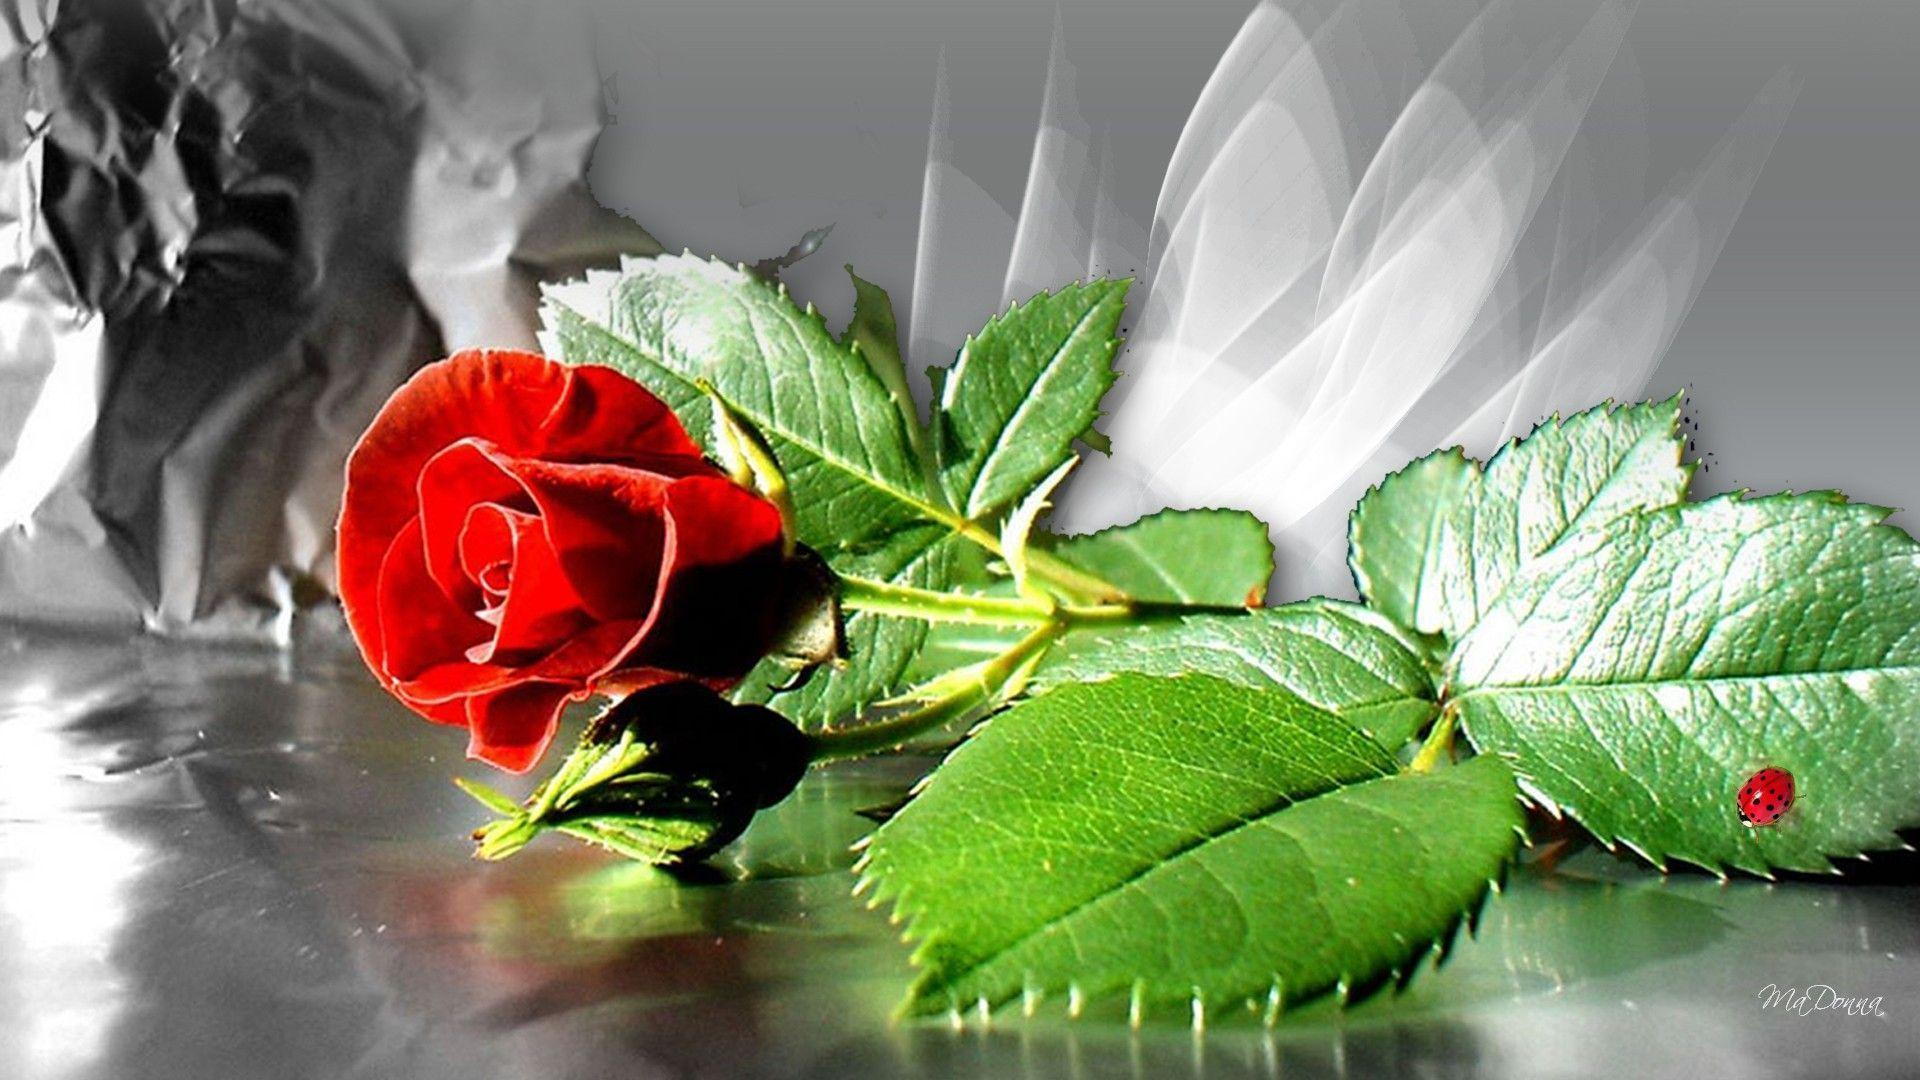 Hd wallpaper red rose - Single Red Rose Wallpaper Free Download